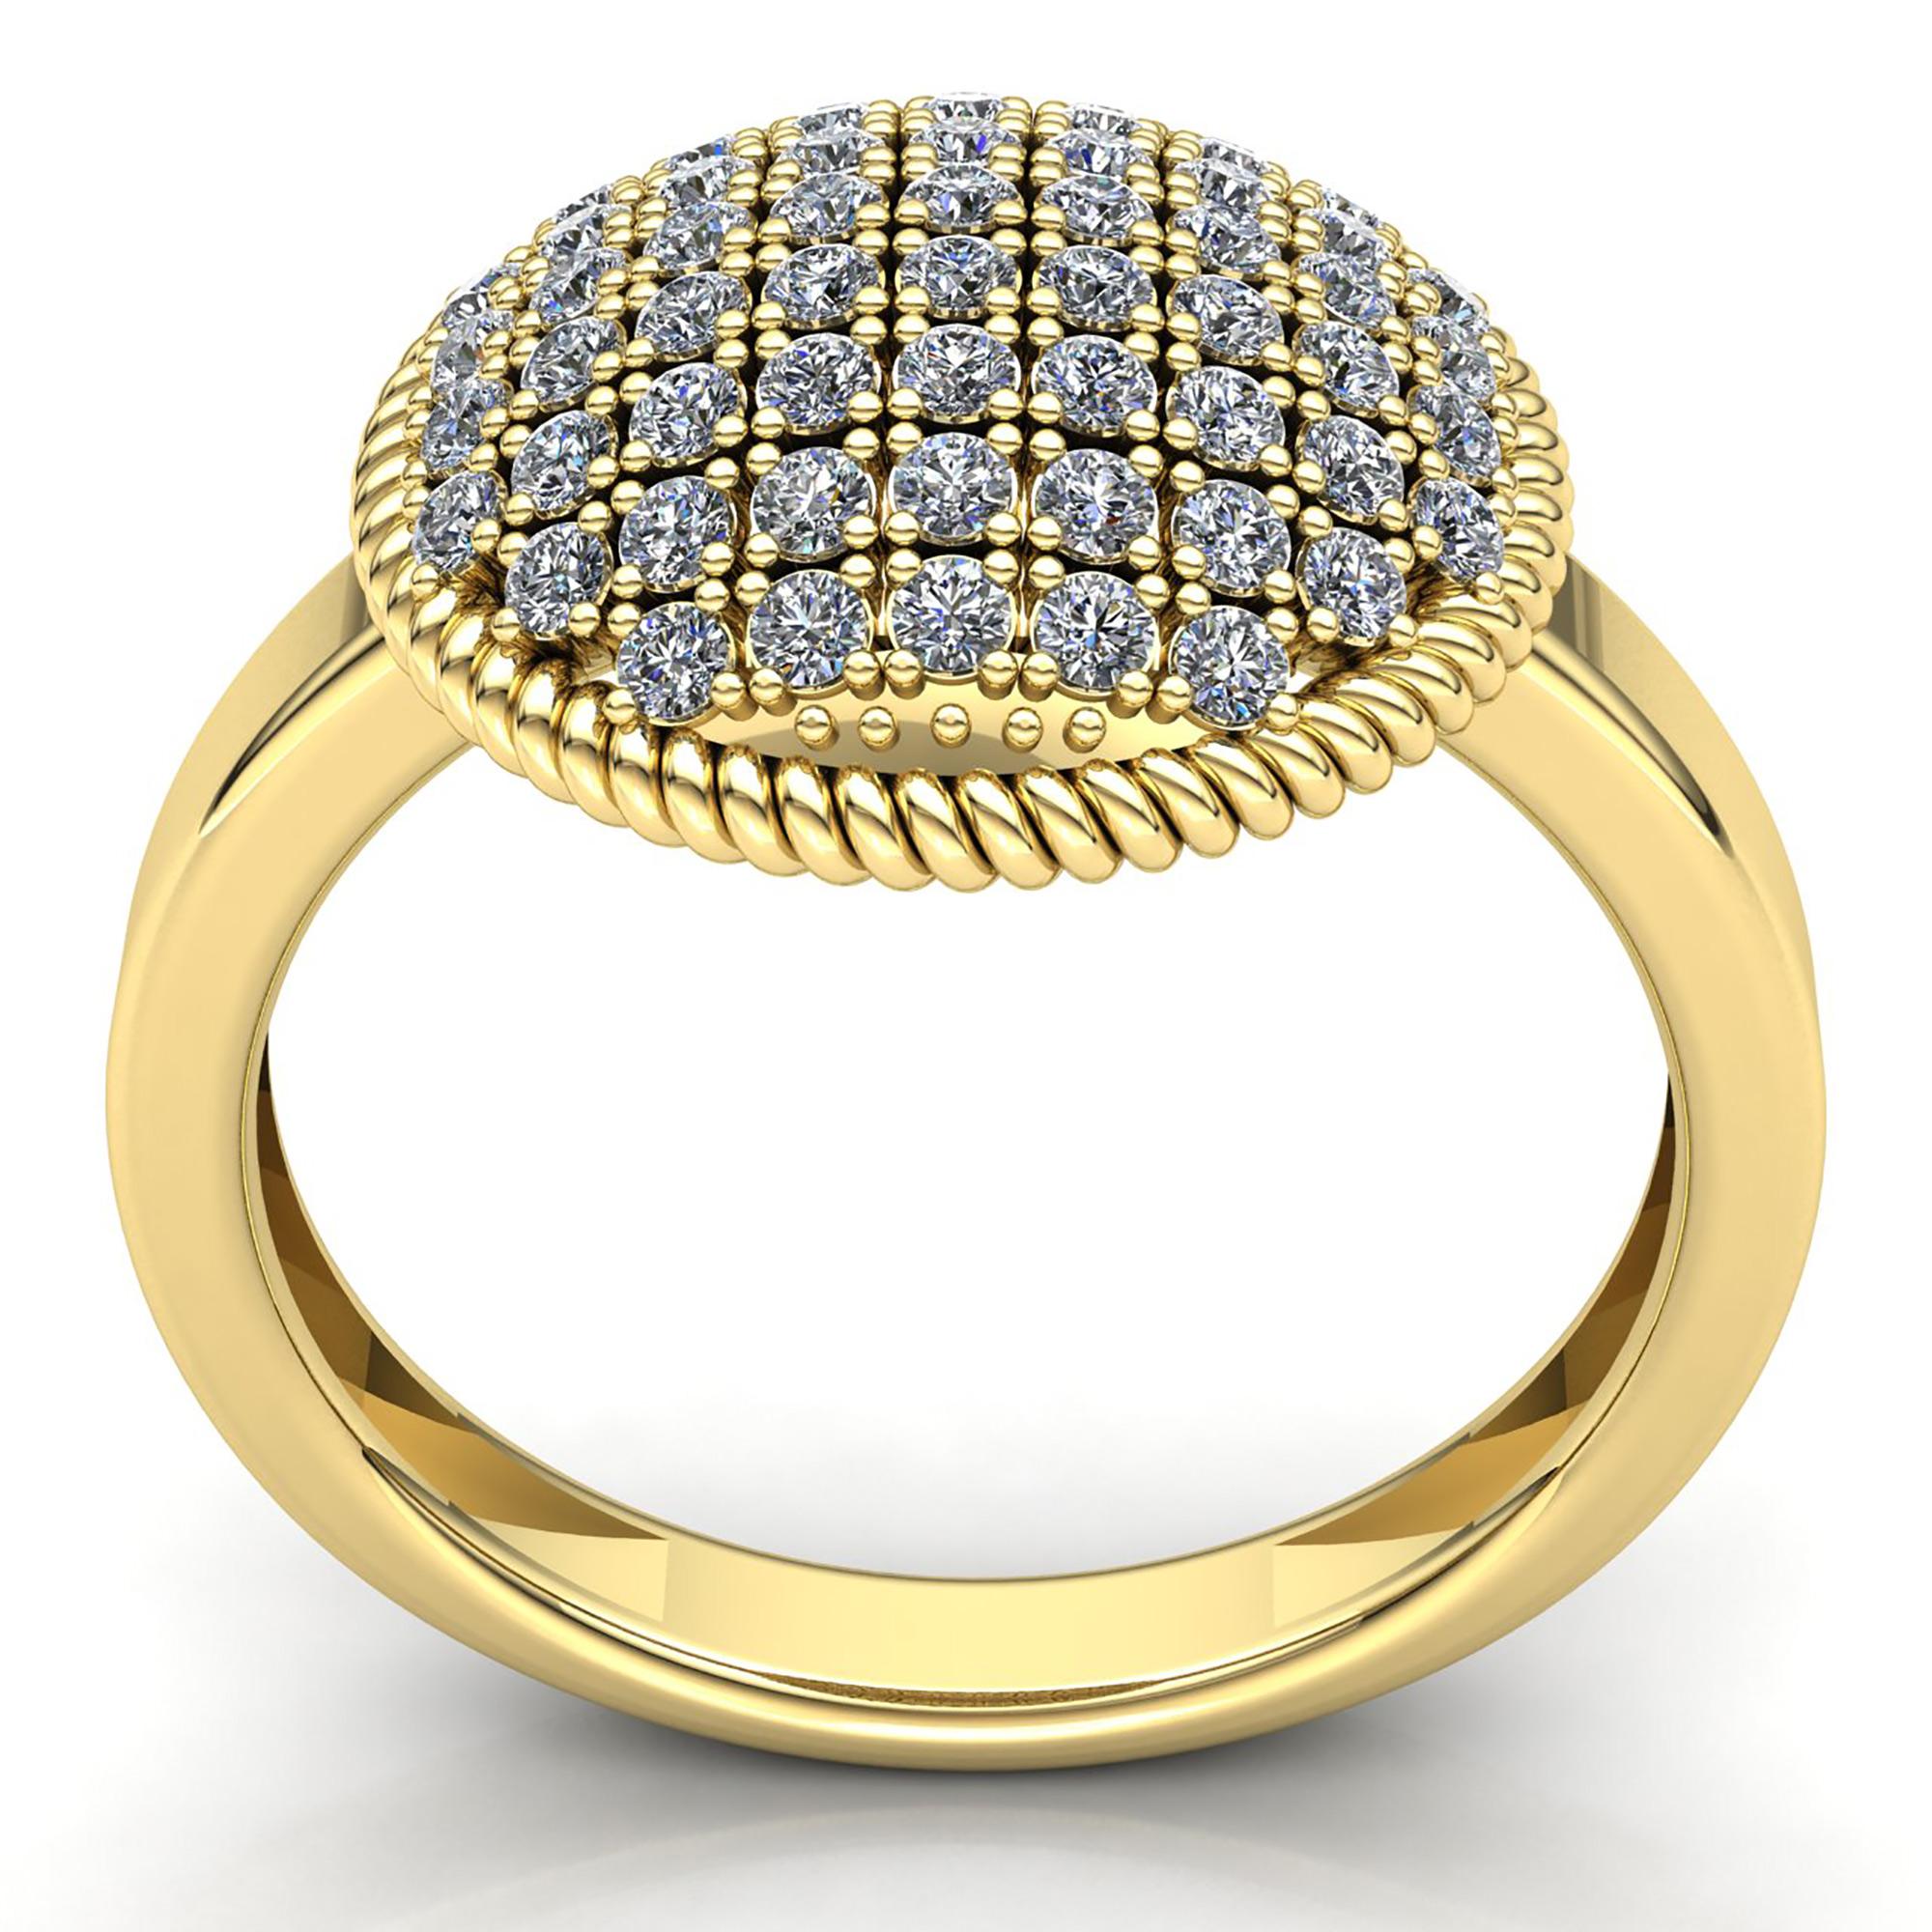 5carat genuine round cut diamond ladies dome cluster engagement ring 14k gold ebay. Black Bedroom Furniture Sets. Home Design Ideas